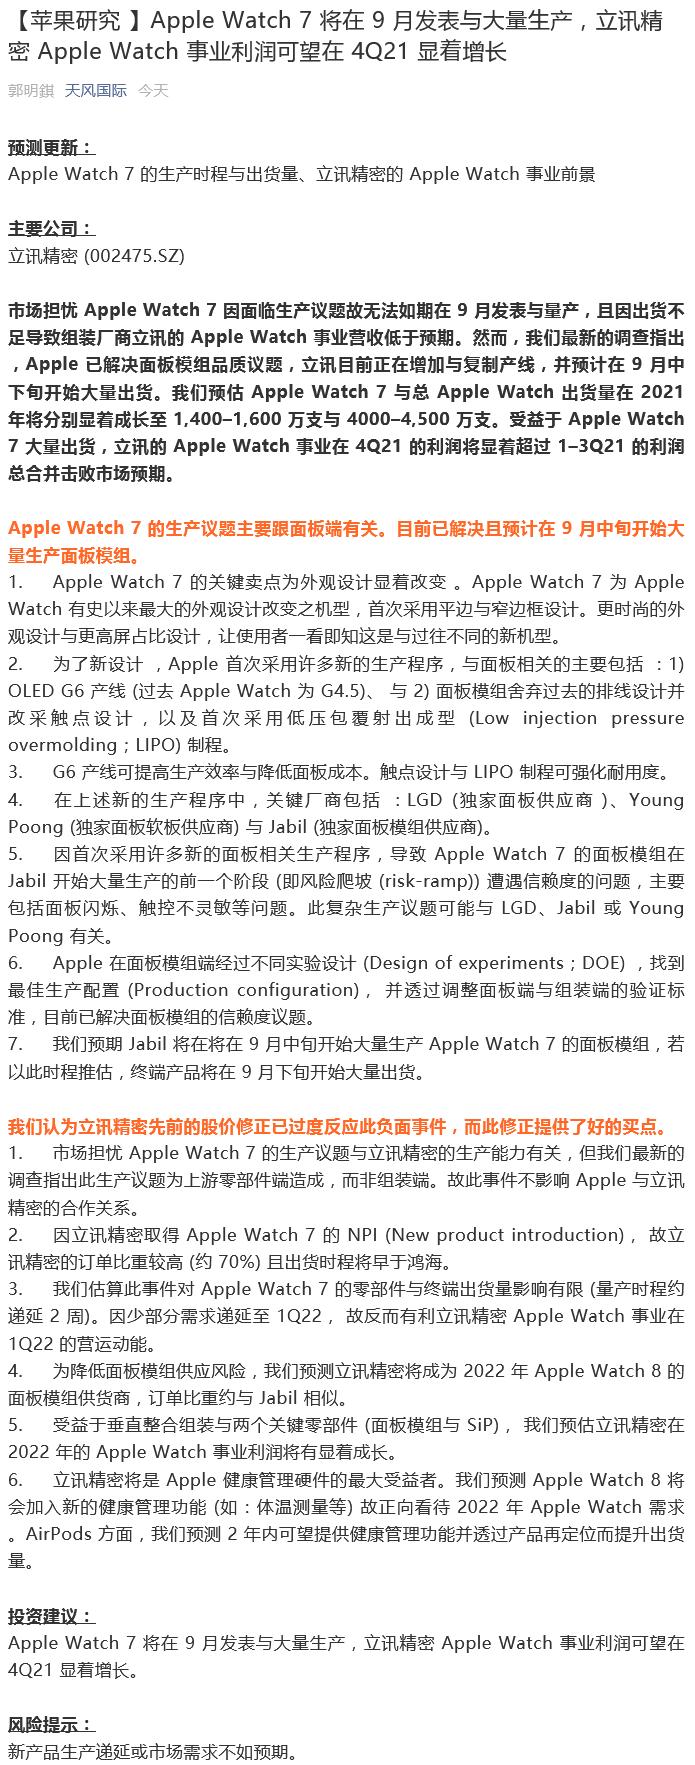 Screenshot 2021-09-10 at 15-28-58 【苹果研究】Apple Watch 7将在9月发表与大量生产,立讯精密Apple Watch事业利润可望在4Q21显着增长.png